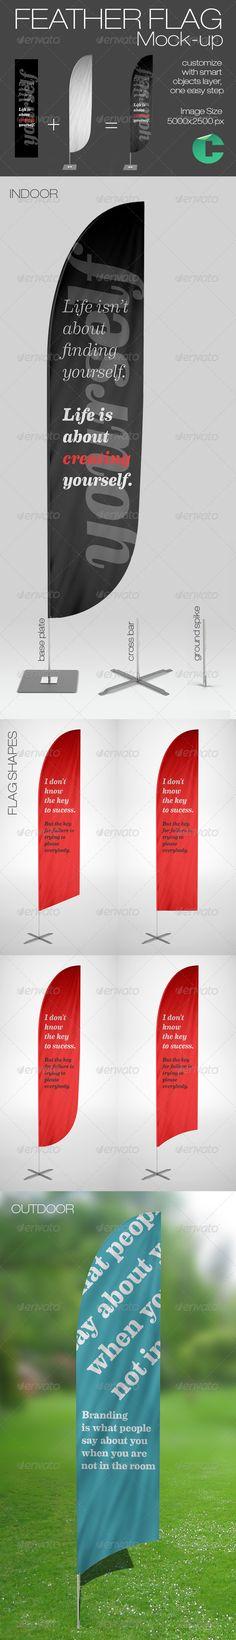 Feather Flag Mock-up  - Signage Print